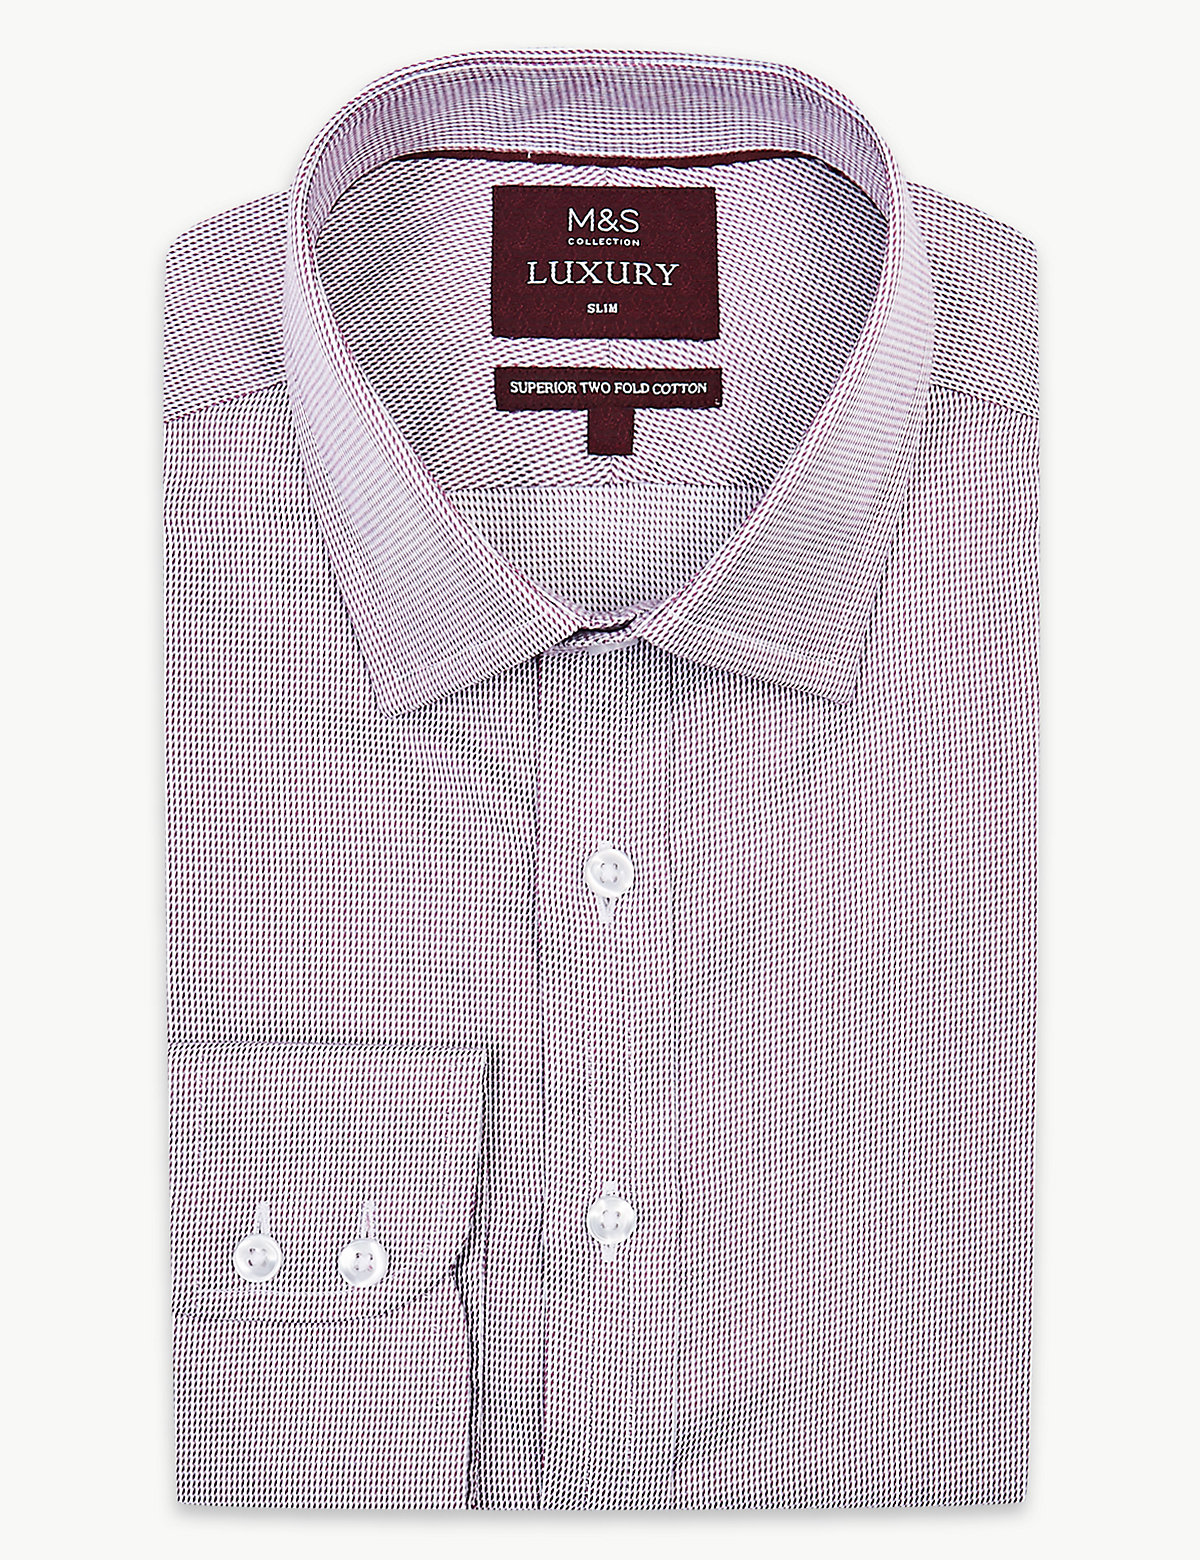 Мужская рубашка слим из хлопка Twill